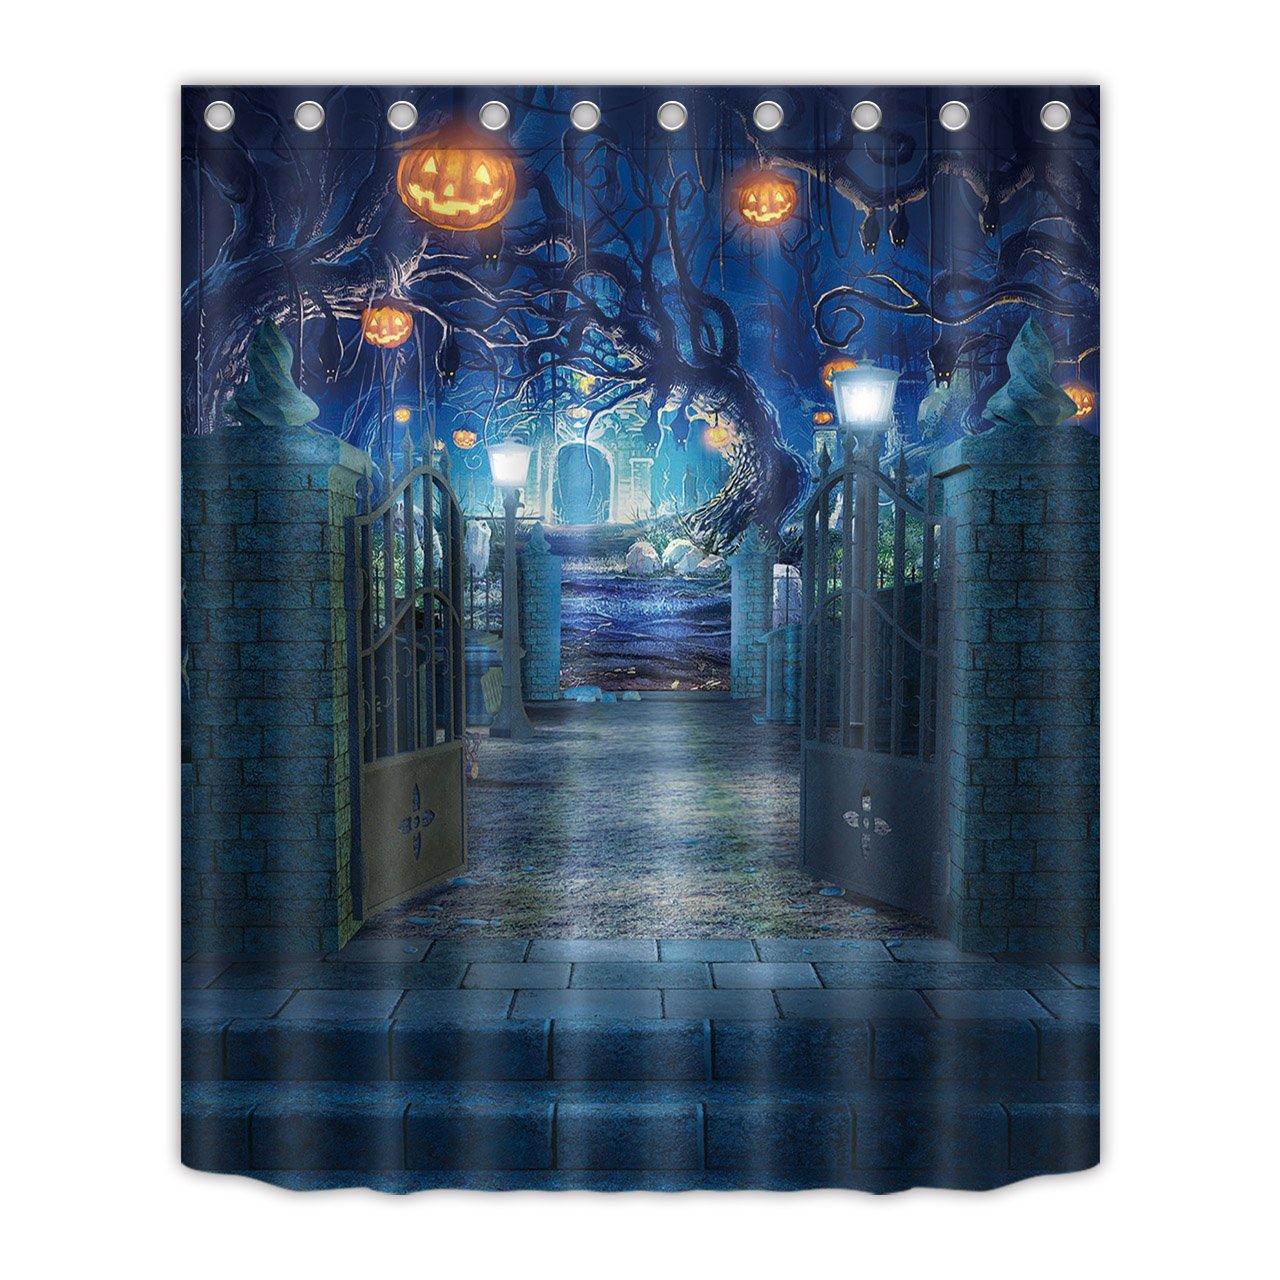 LB Decorations Shower Curtain Set, Halloween Pumpkin Decor Bath Curtain 60x72 inch Polyester Fabric Bathroom Curtains Hooks Anti Bacterial Waterproof